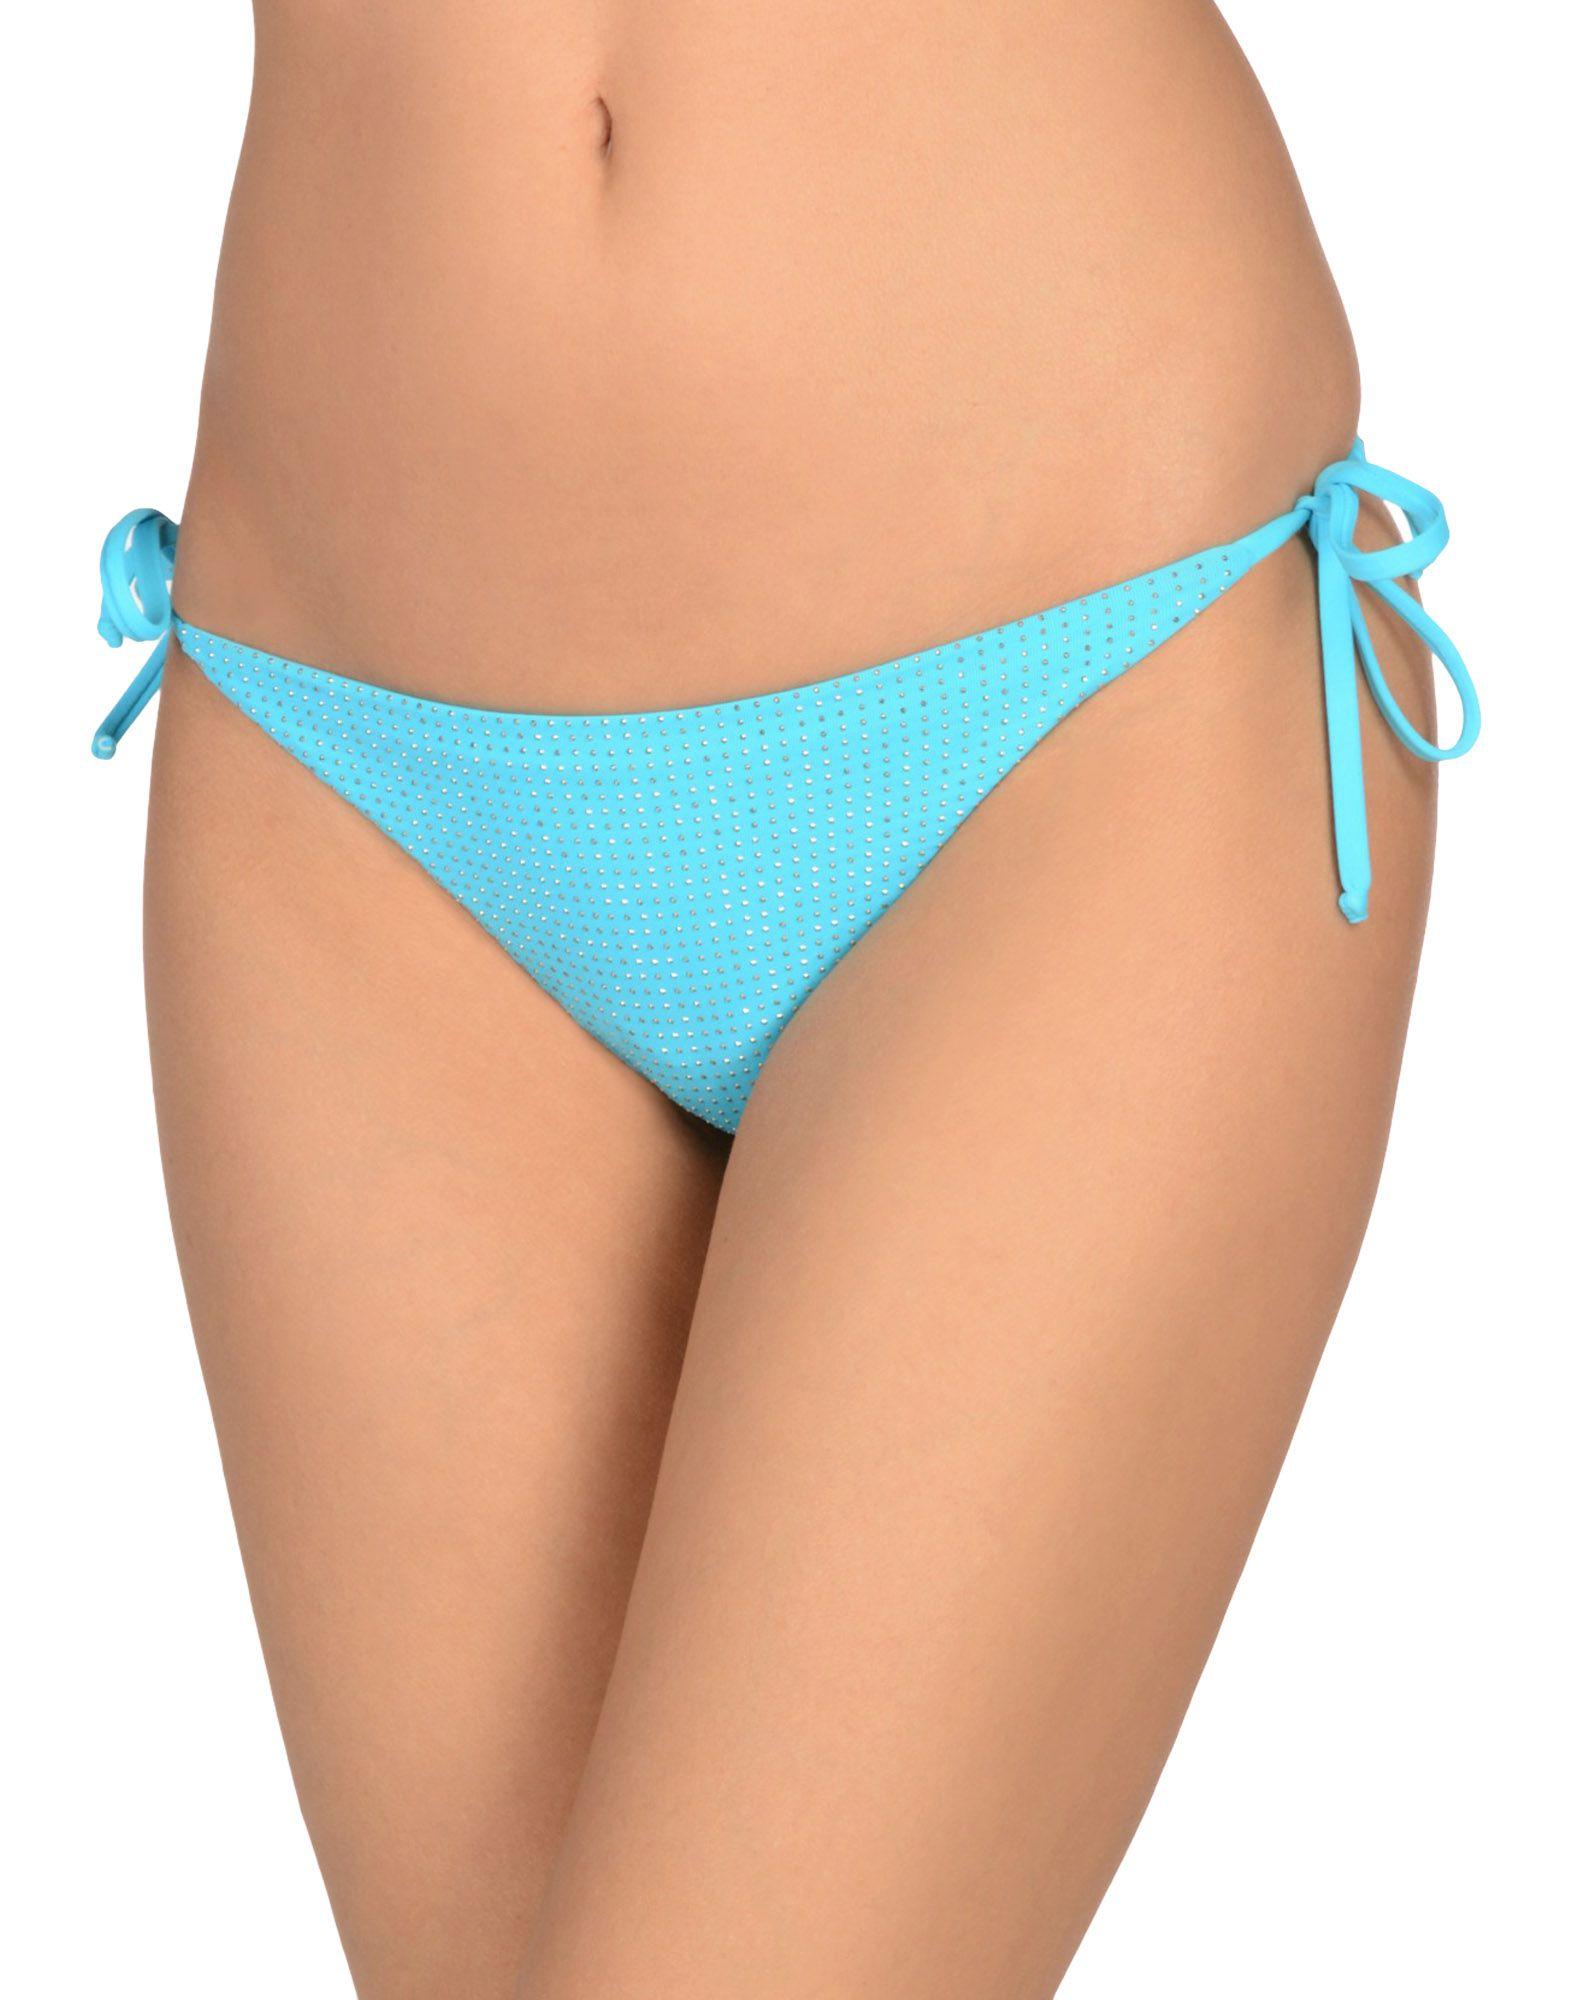 Bikini Fisico Donna - Acquista online su YZnyBh5ka